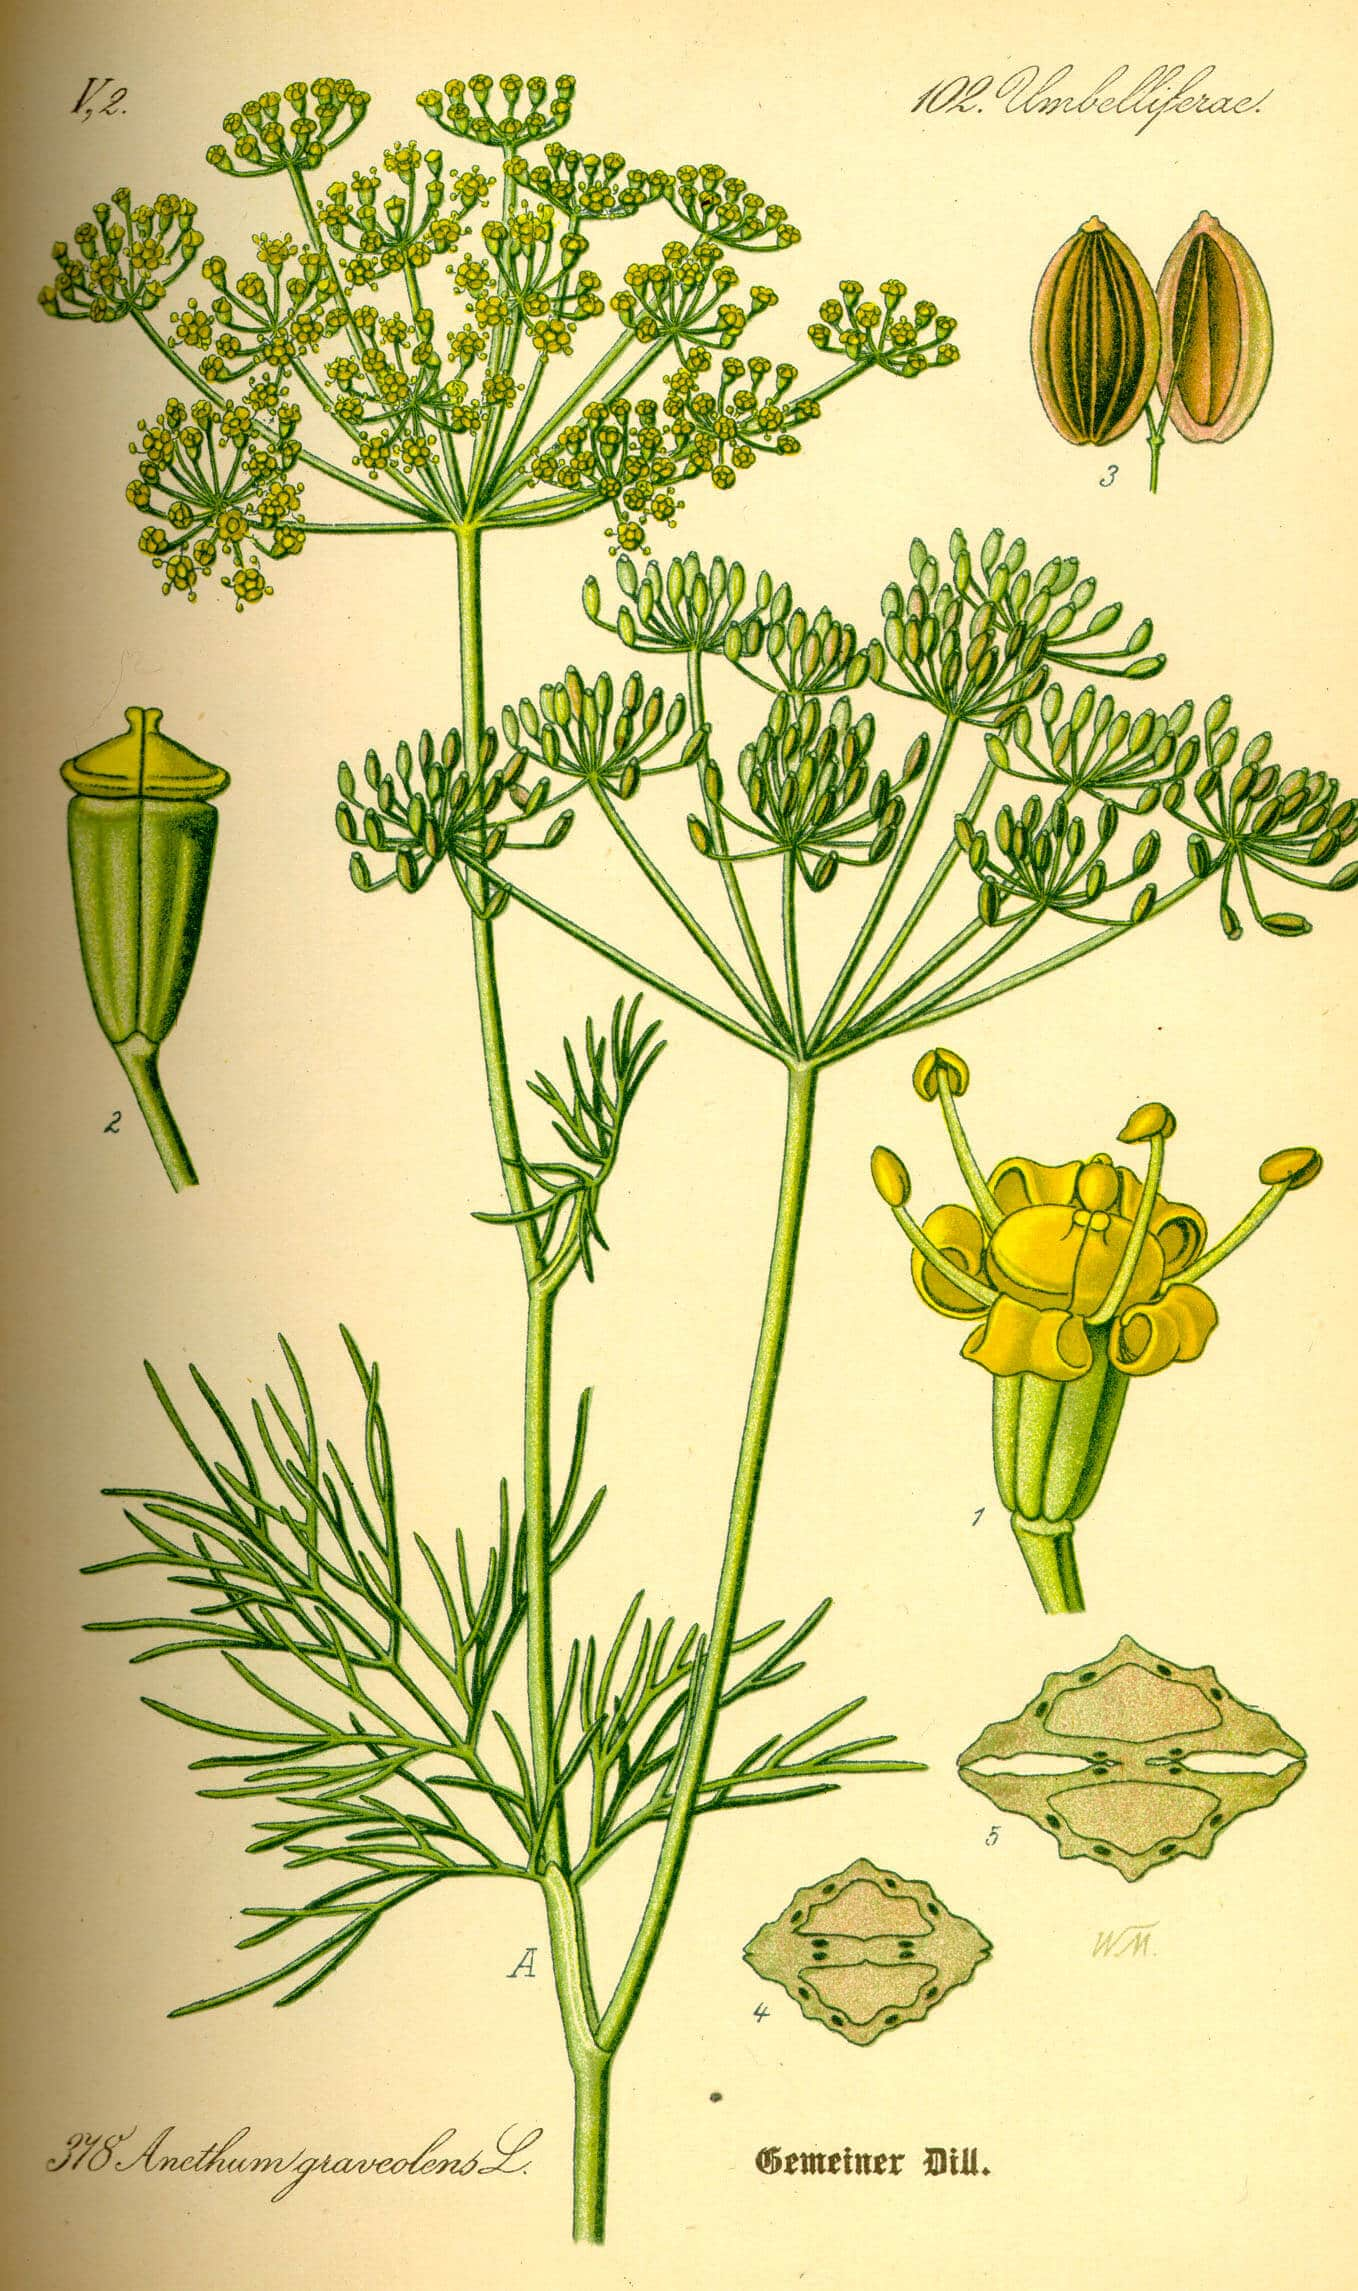 Kapor (Anethum graveolens L.)